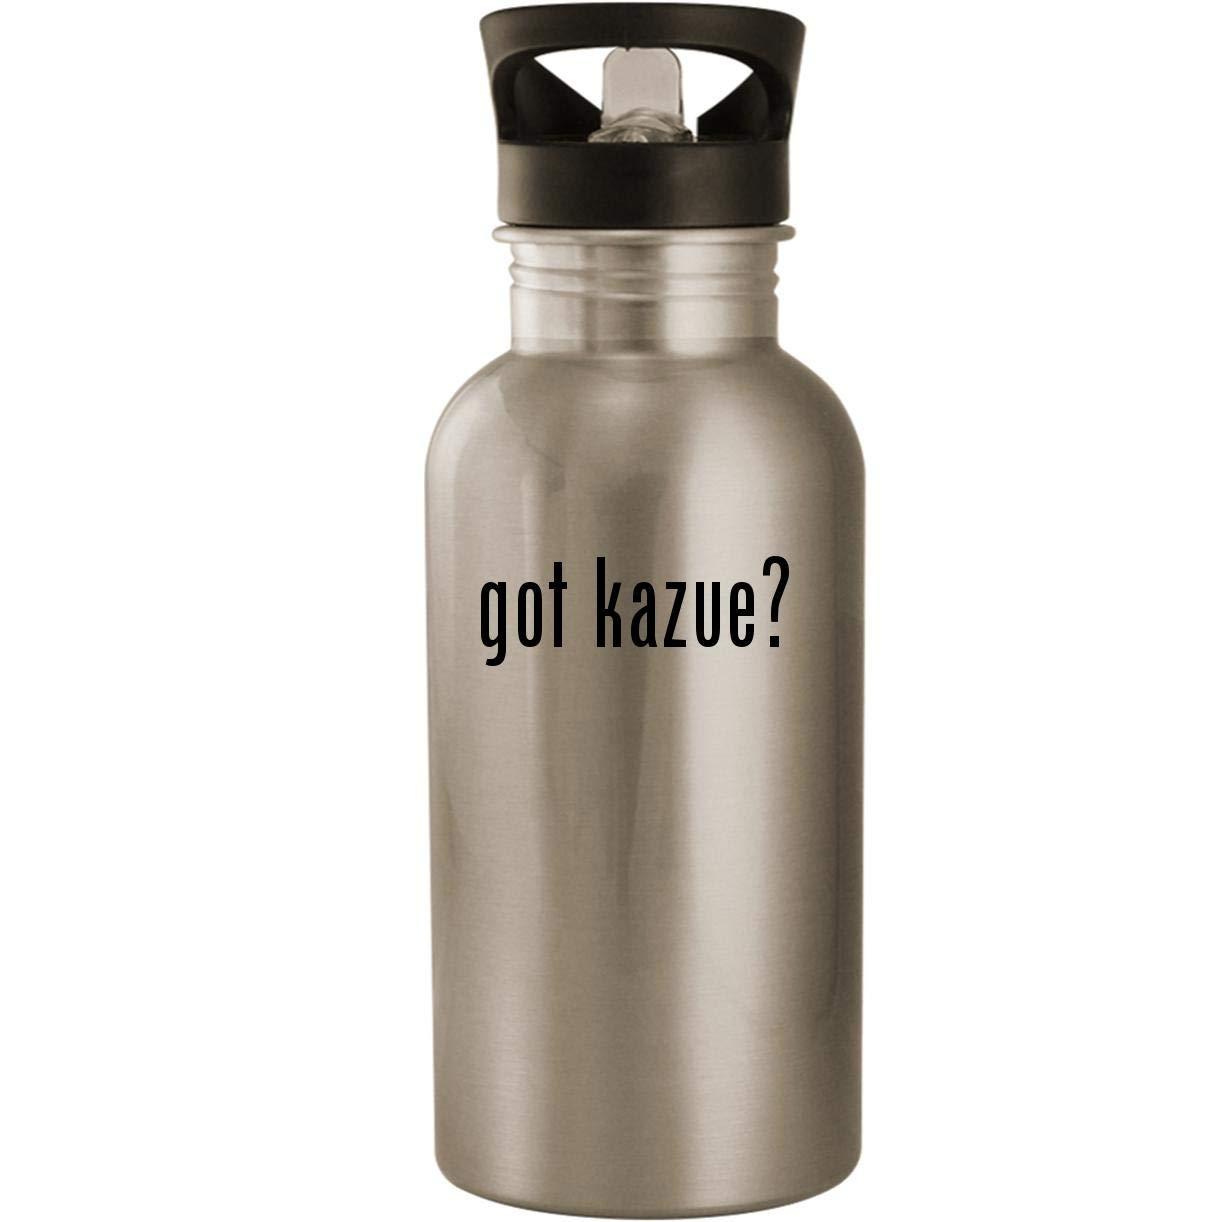 got kazue? - Stainless Steel 20oz Road Ready Water Bottle, Silver